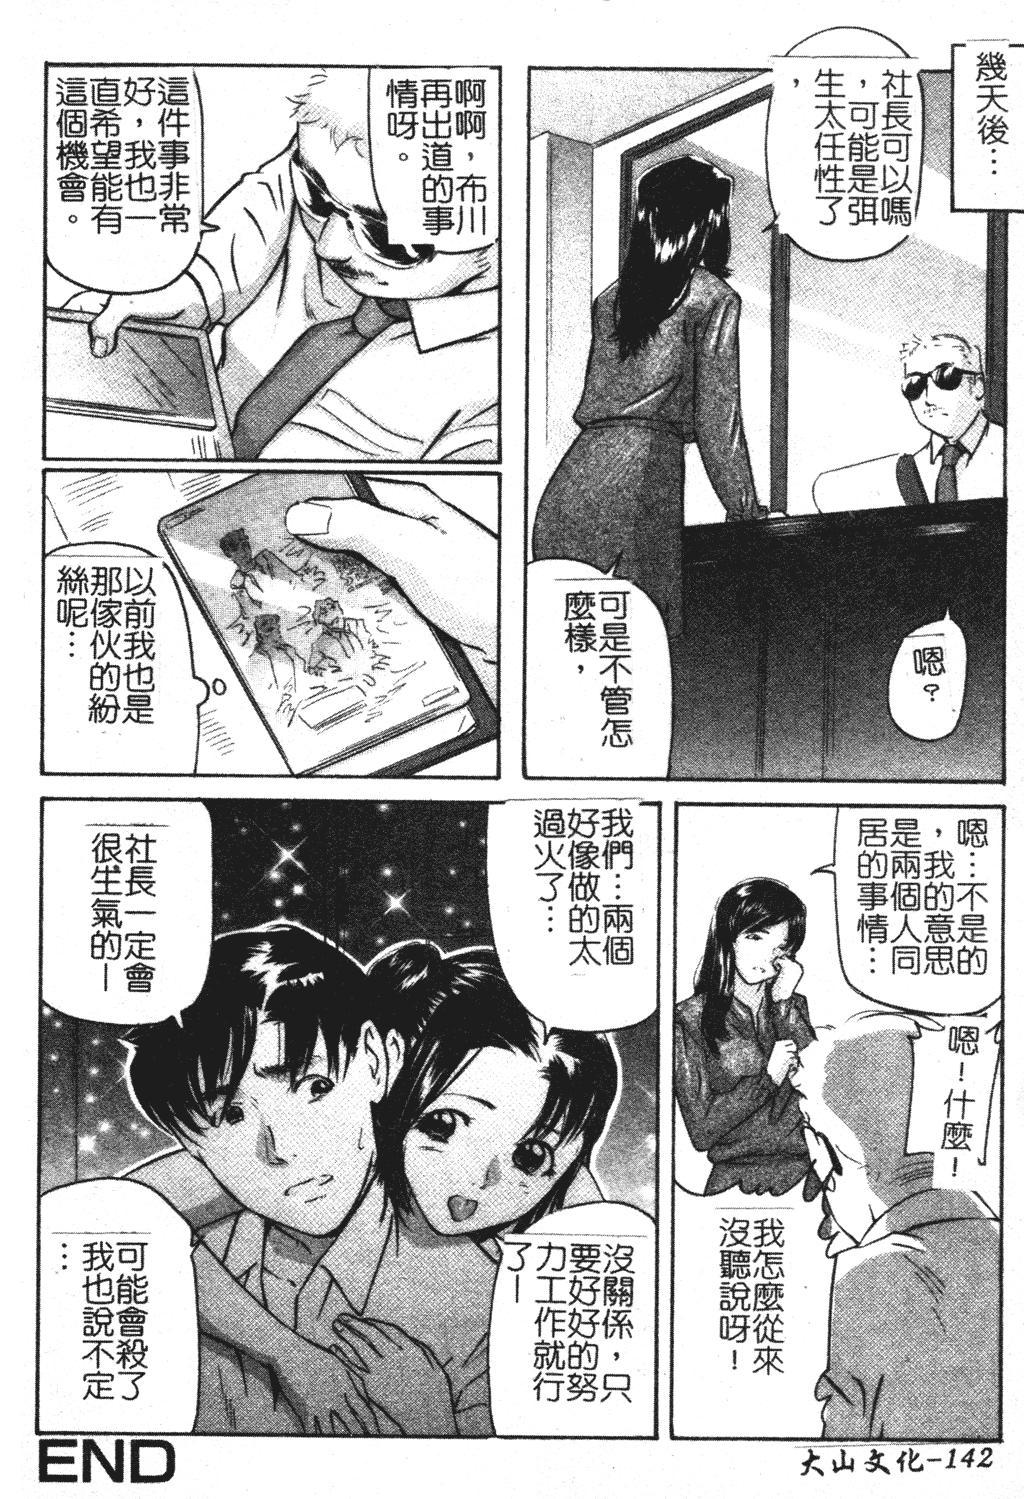 Ikenai Asobi 142